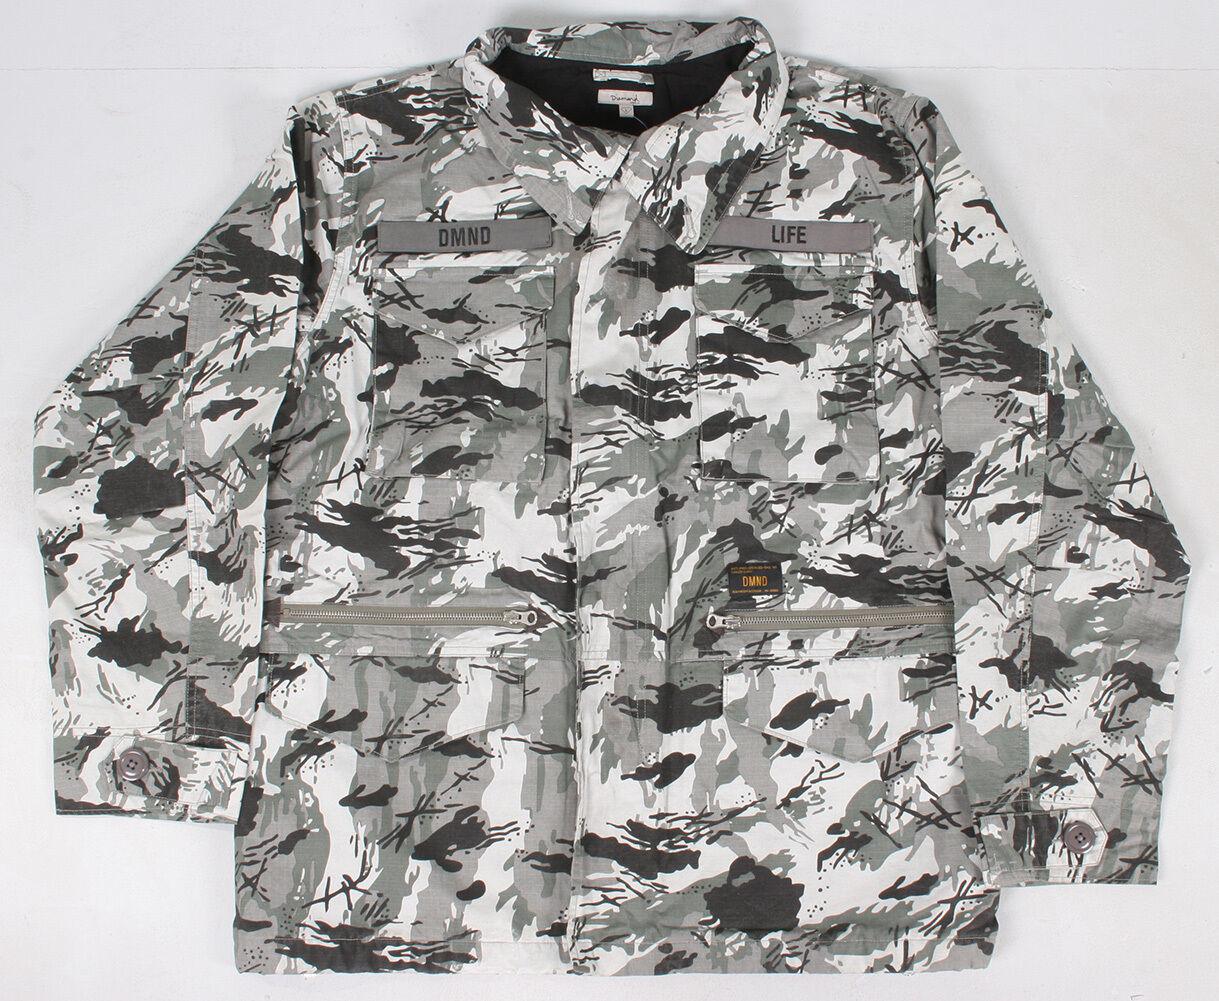 Diamond Supply Co. Hombre Camuflaje M65 Chaqueta Nwt Gris